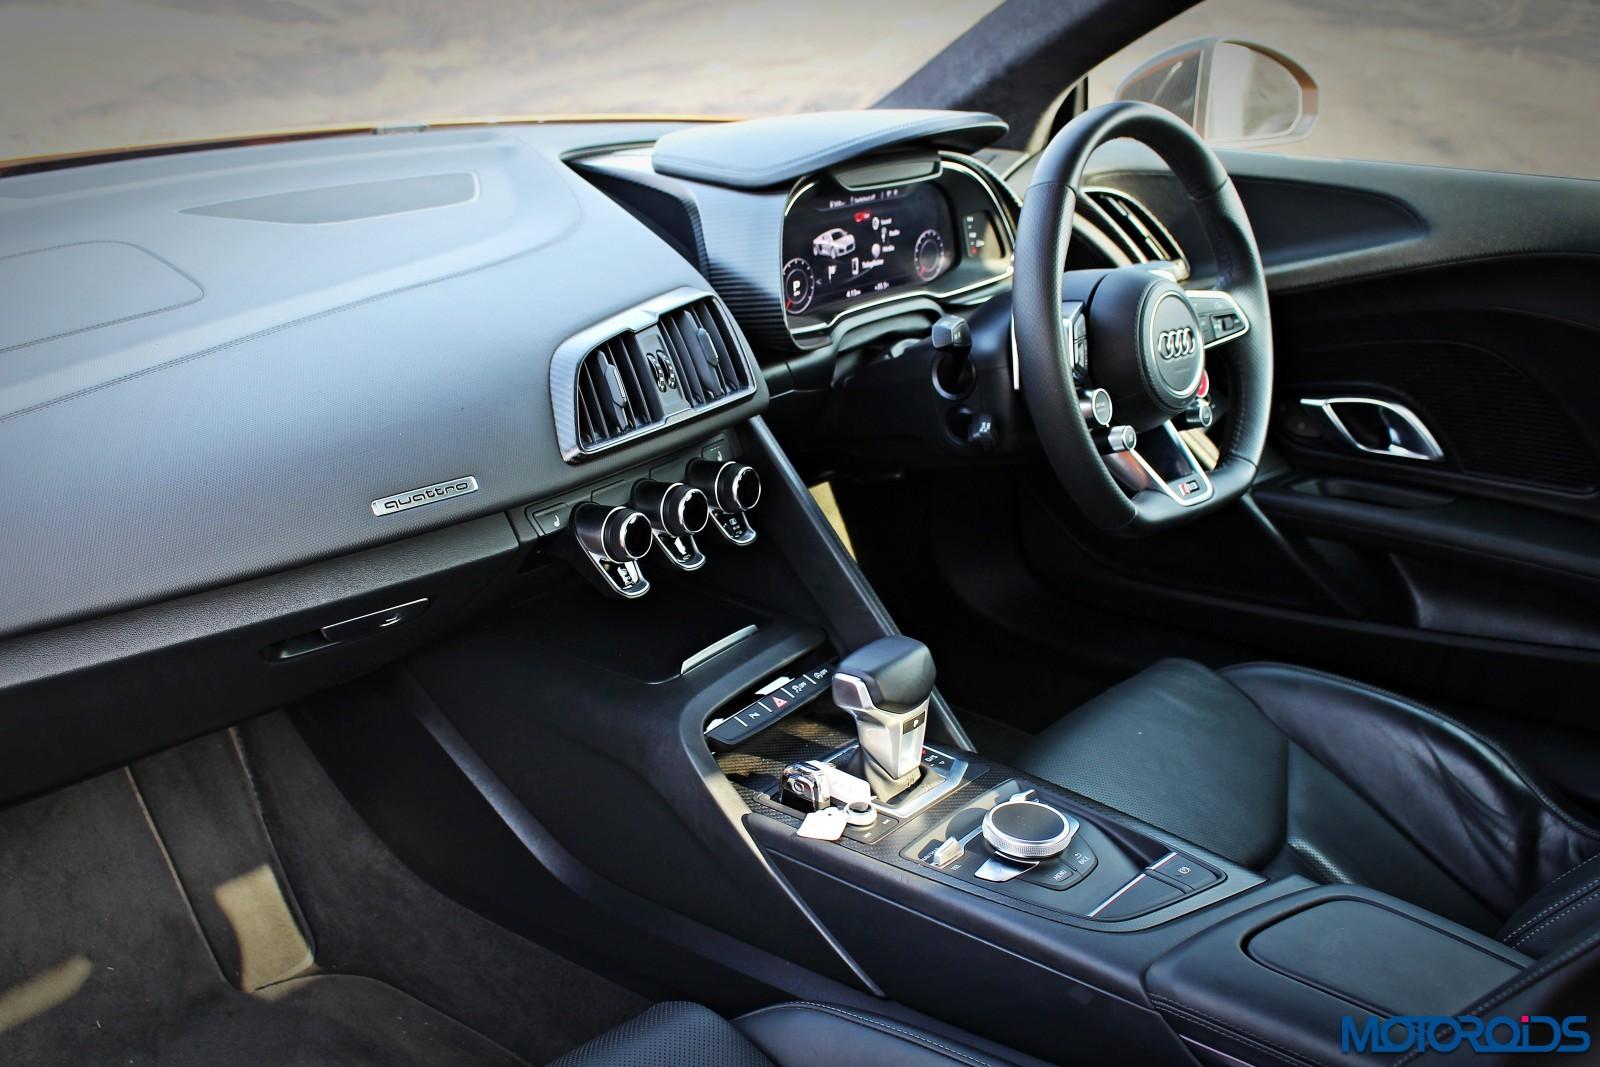 New-Audi-R8-V10-Plus-dashboard-2